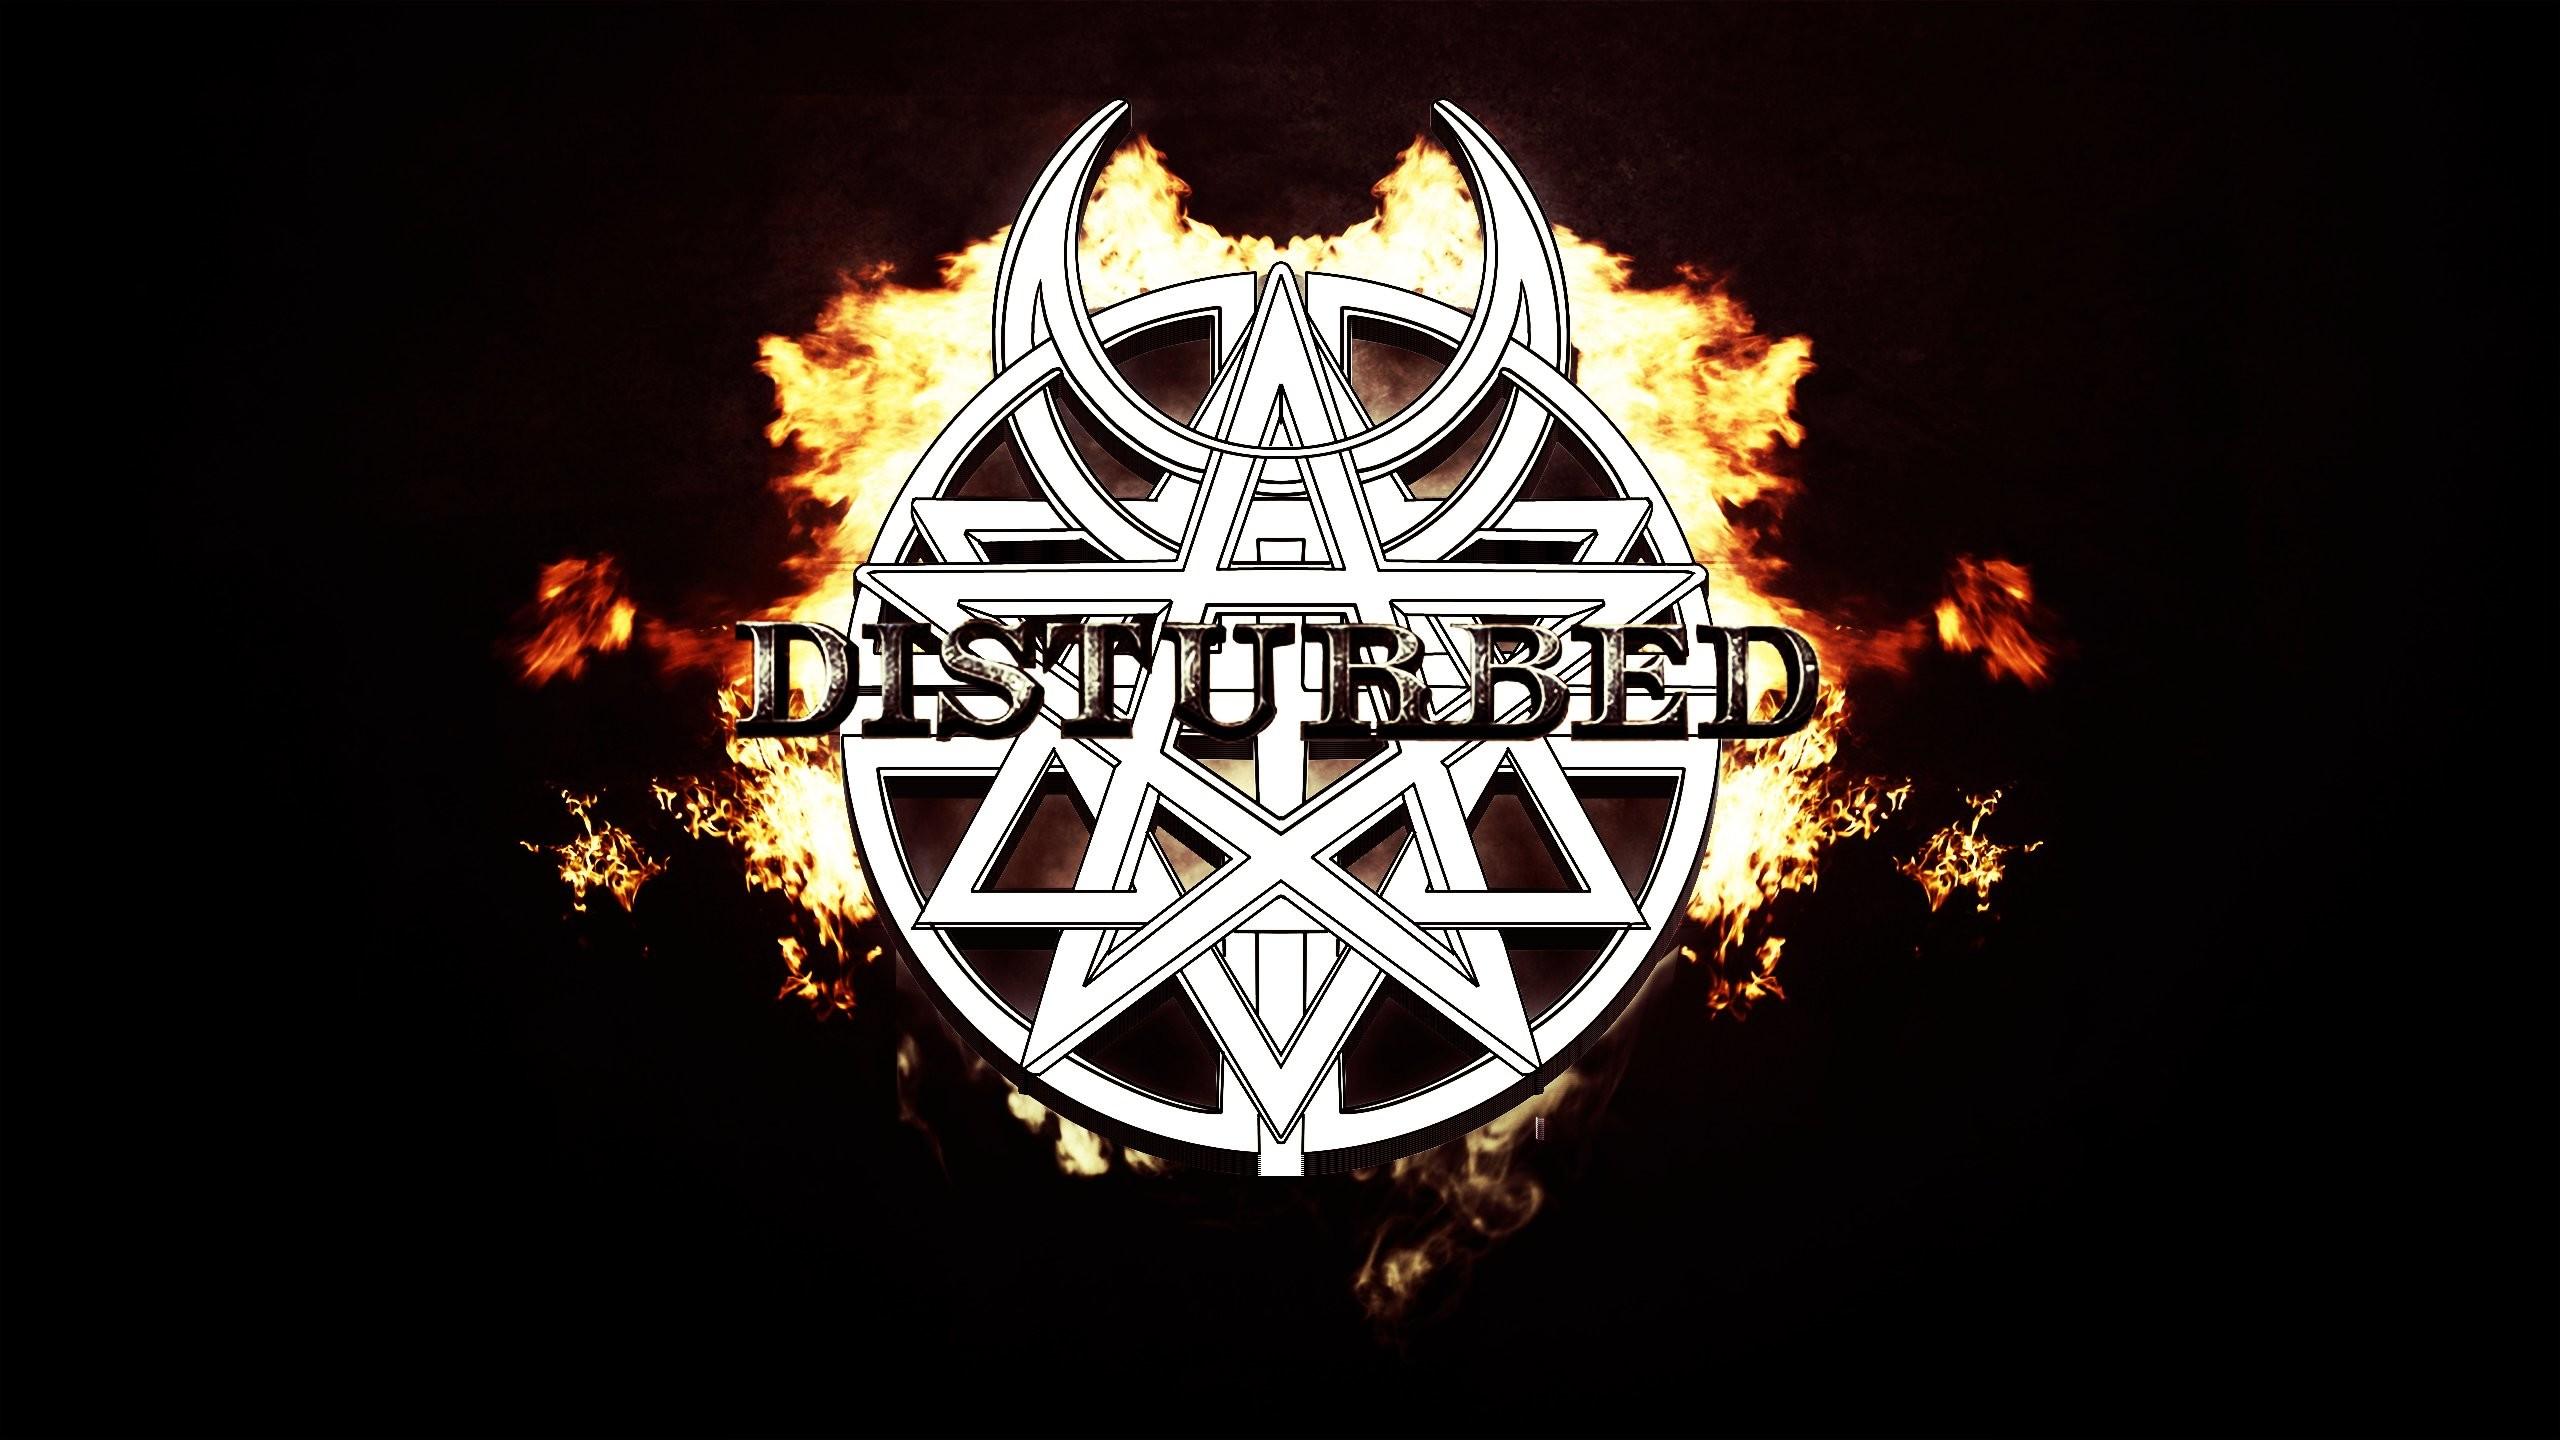 DISTURBED heavy metal alternative metal hard rock nu-metal wallpaper |  | 492220 | WallpaperUP